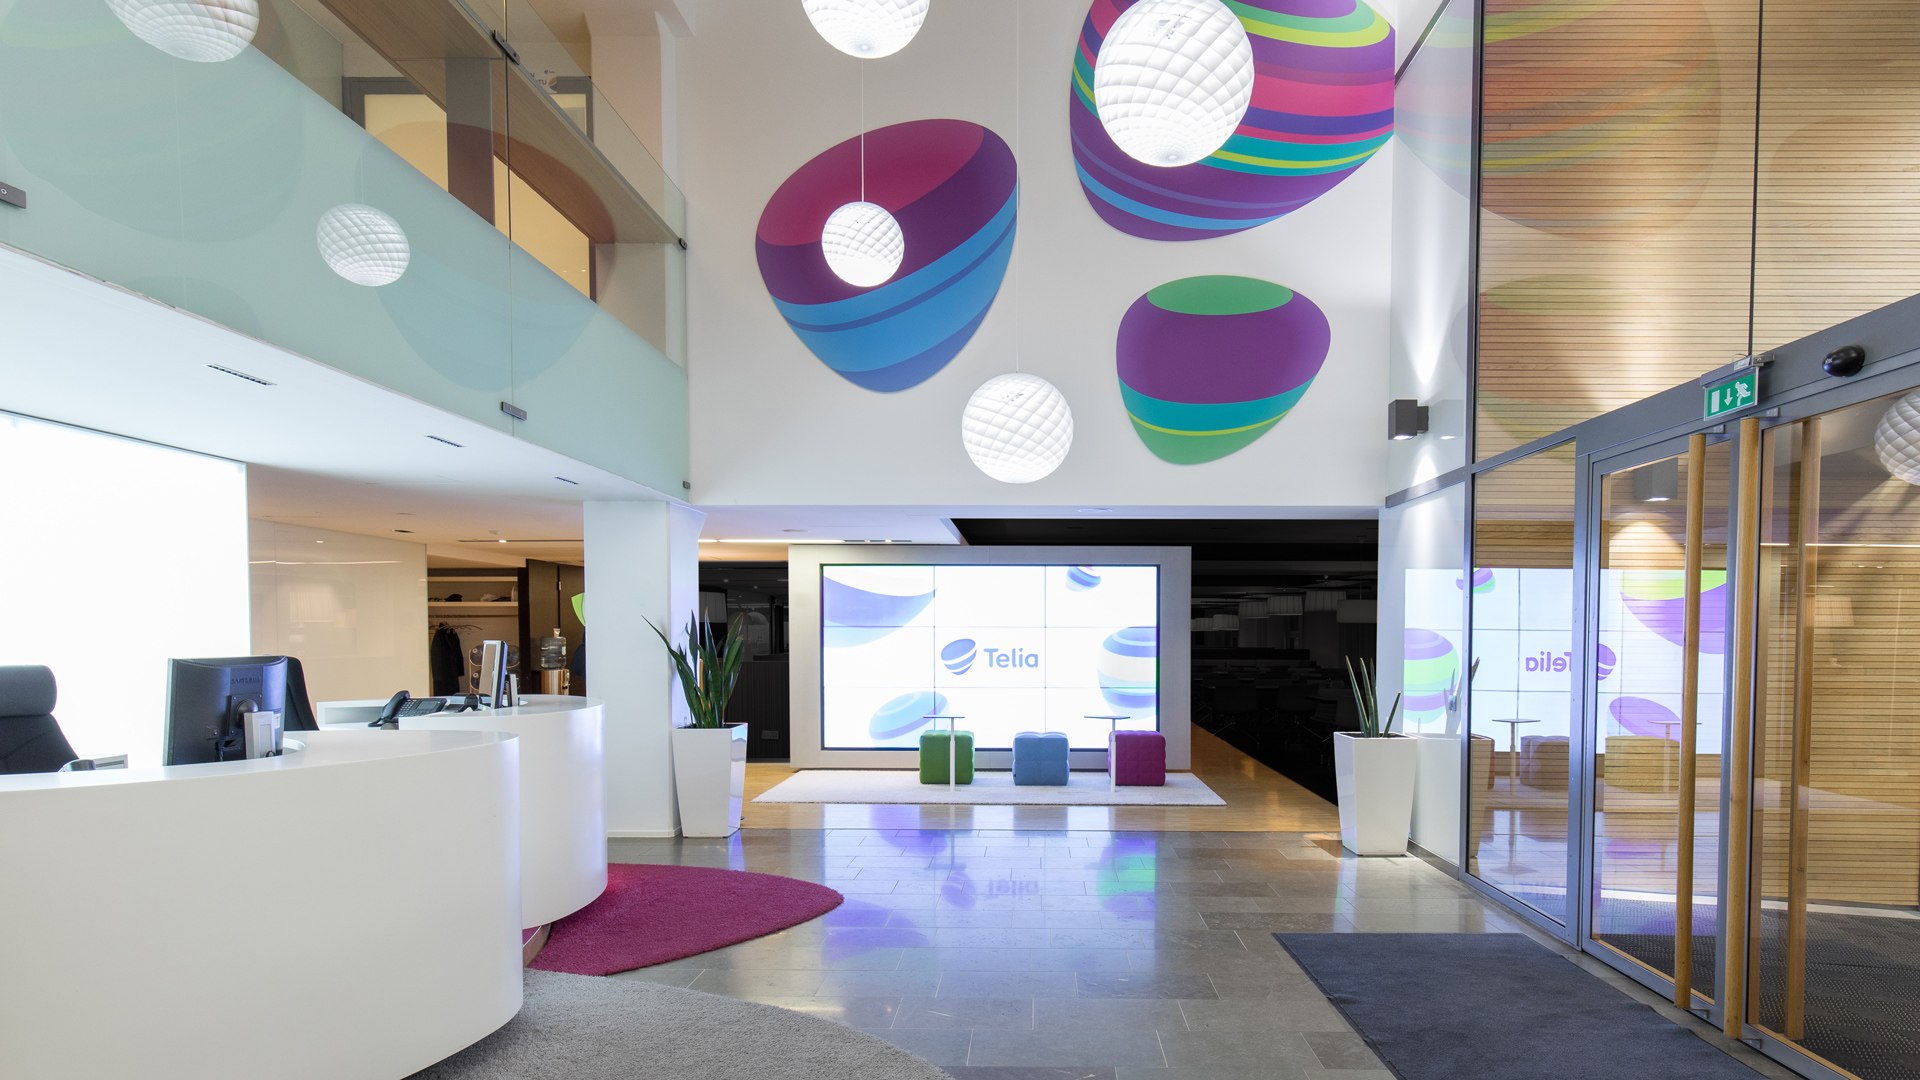 Telia-Finland-Headquarters-Teollisuuskatu-GI-Project-11